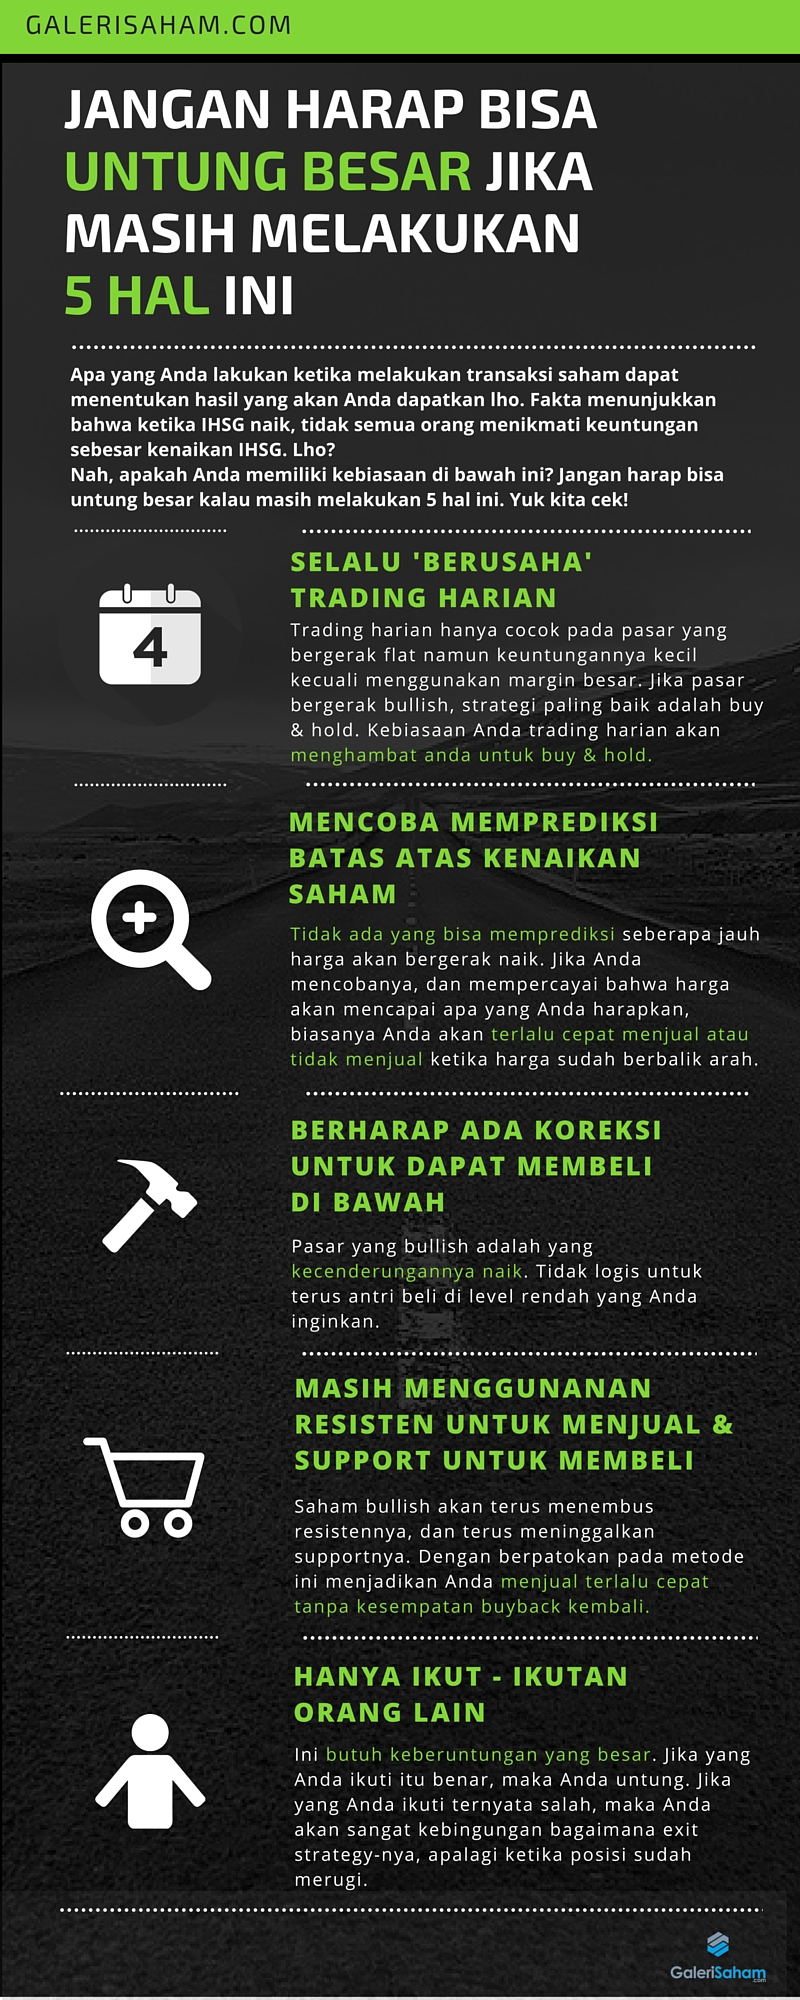 5 hal berbahaya